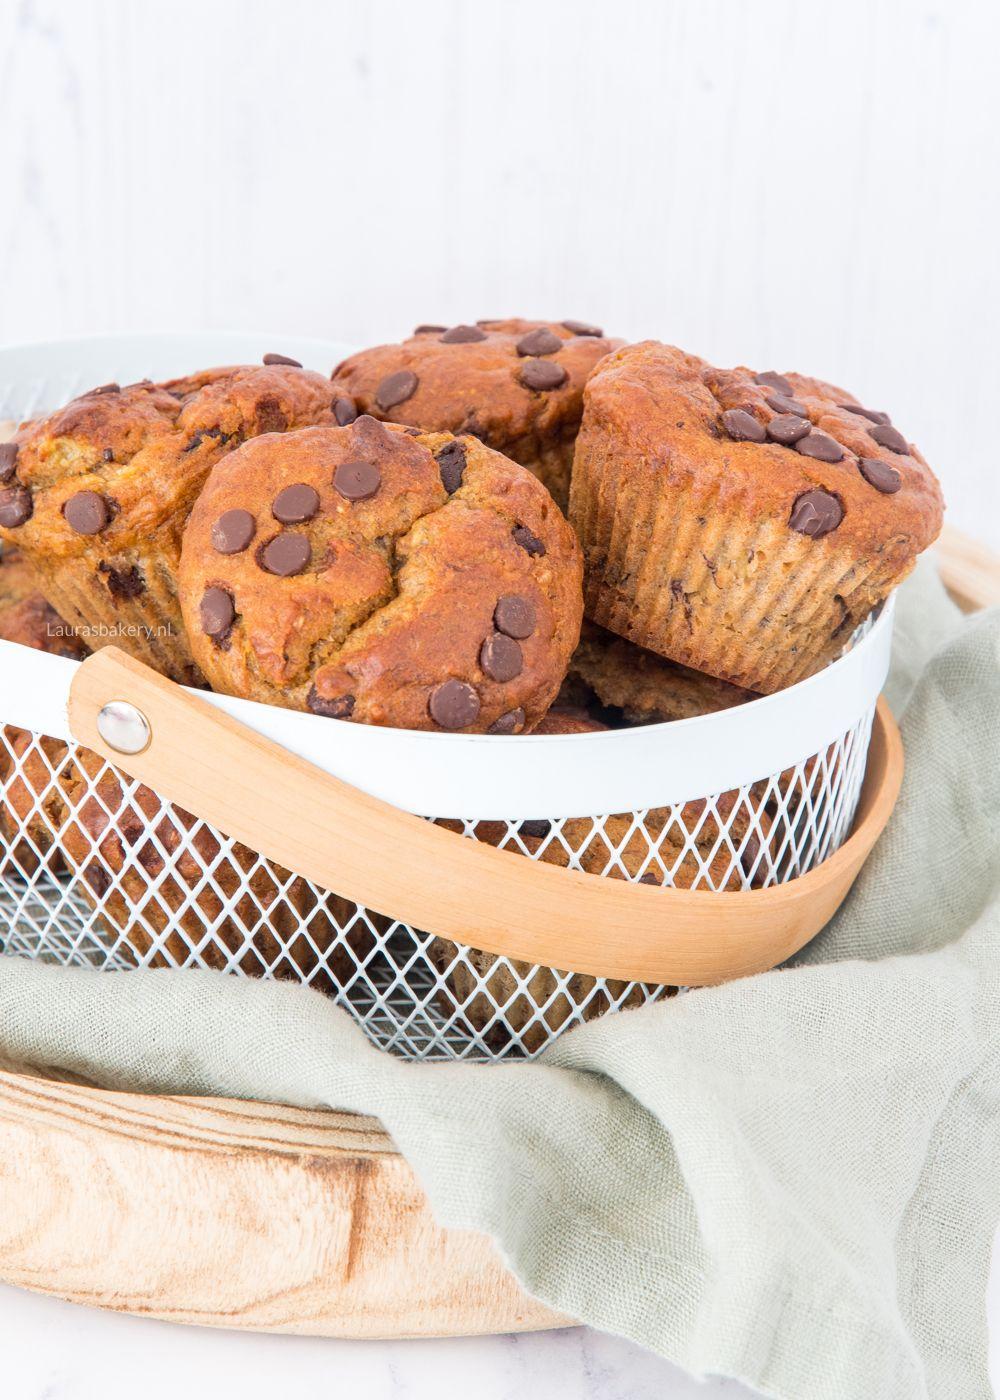 Banaan-pindakaas muffins